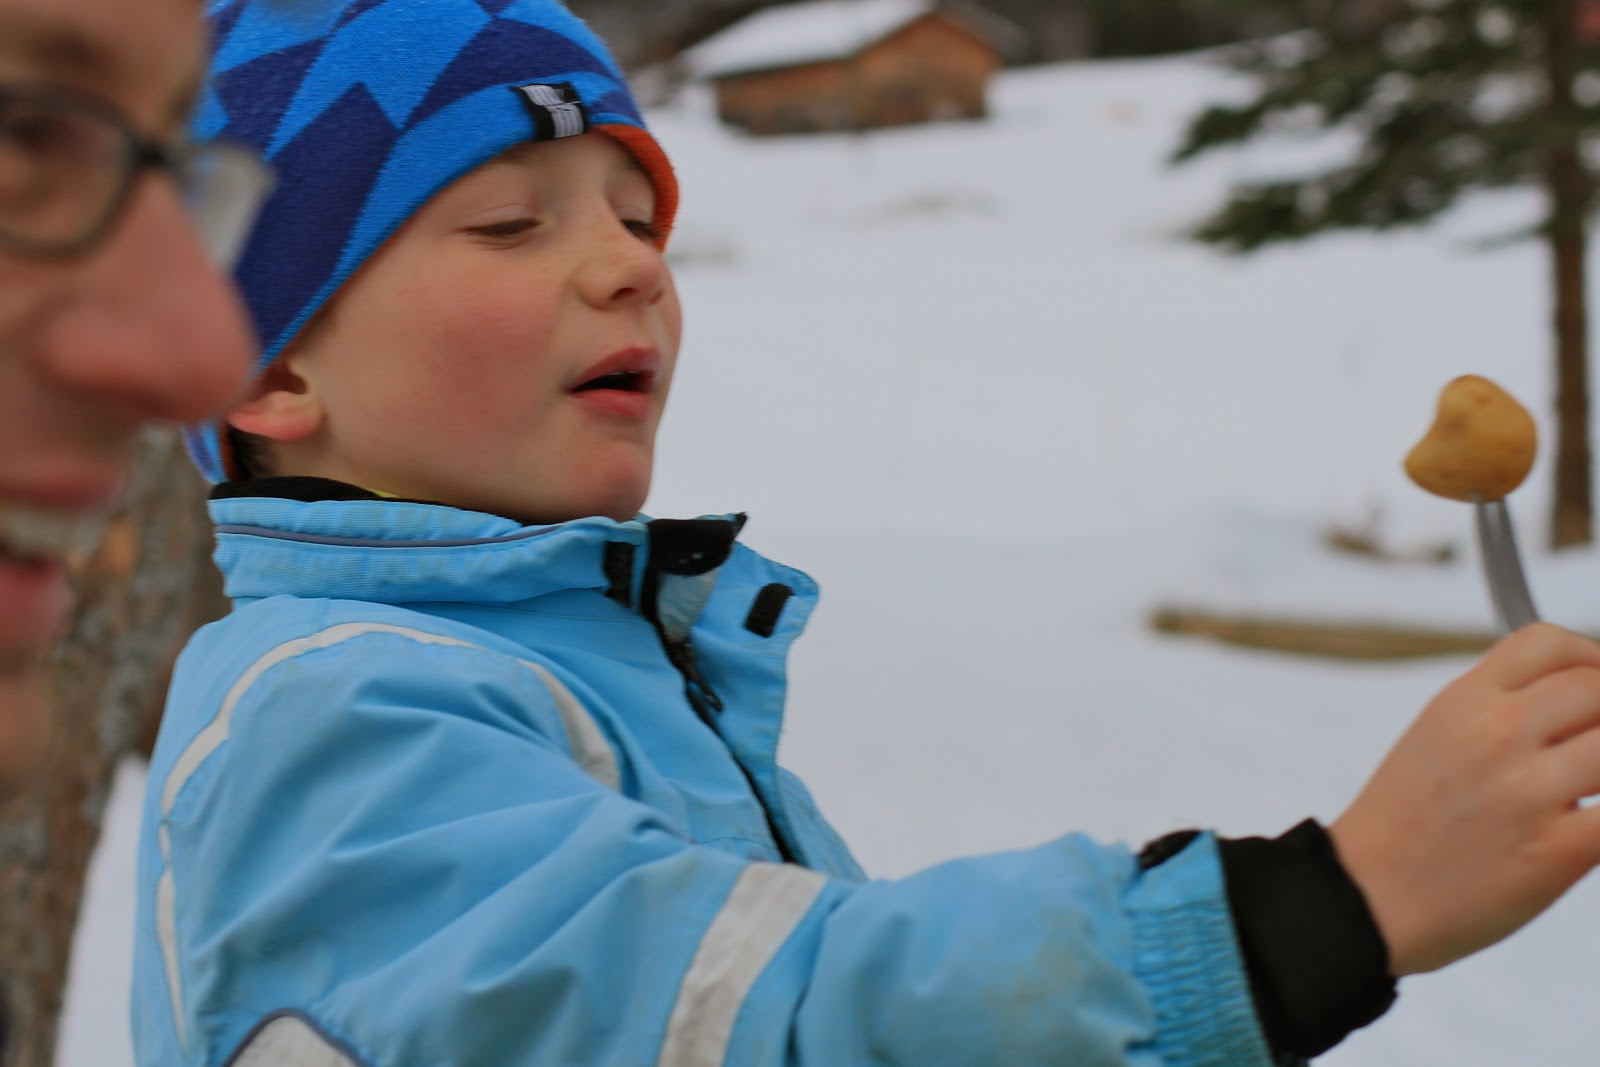 winter mensch schal handschuh lustig